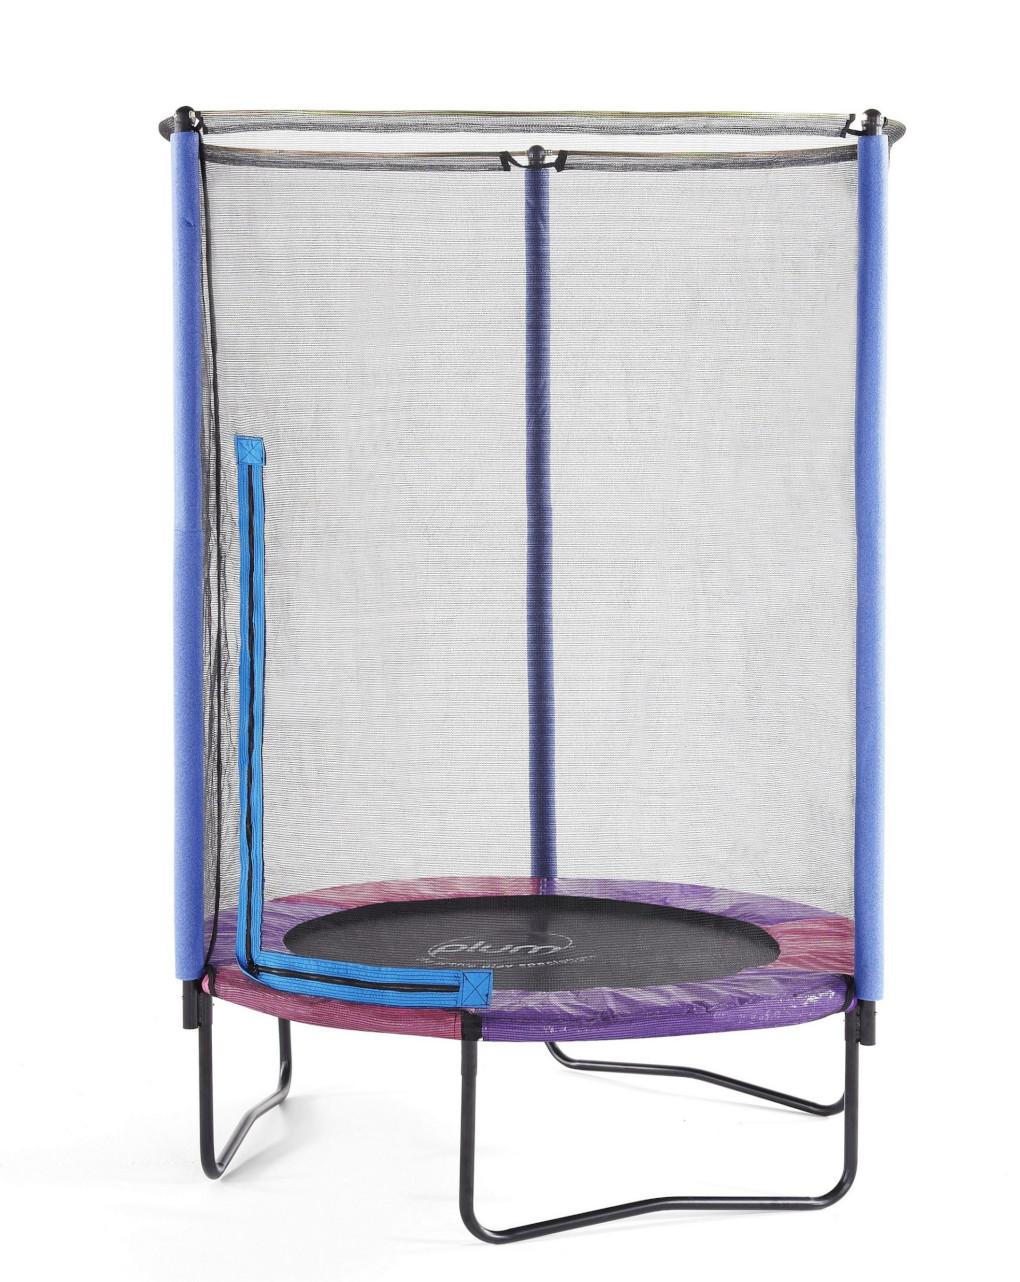 Sun&sport - trampolino junior - Sun&Sport